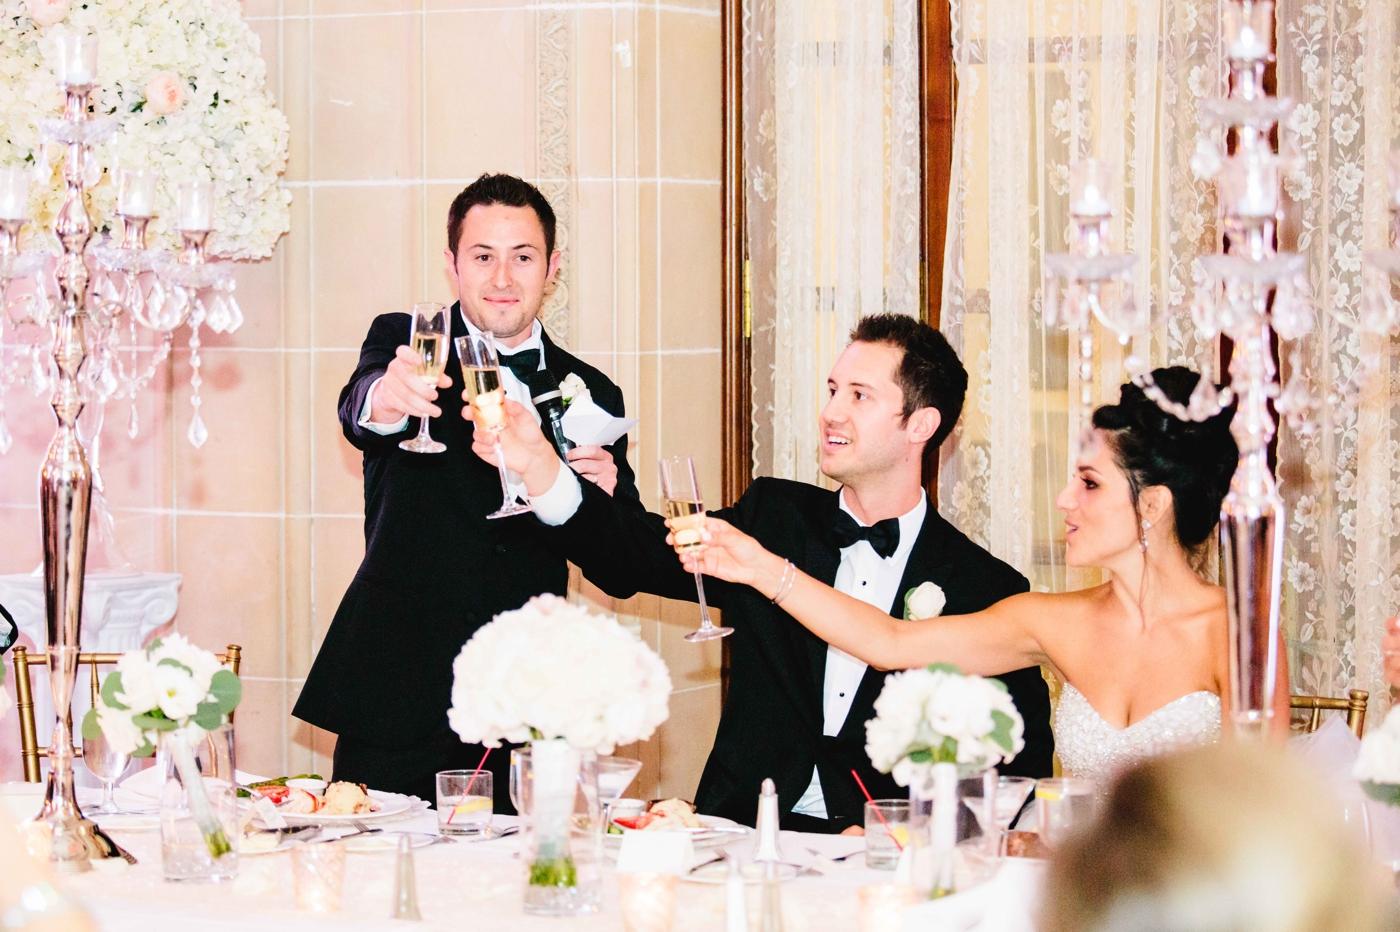 chicago-fine-art-wedding-photography-smeja52